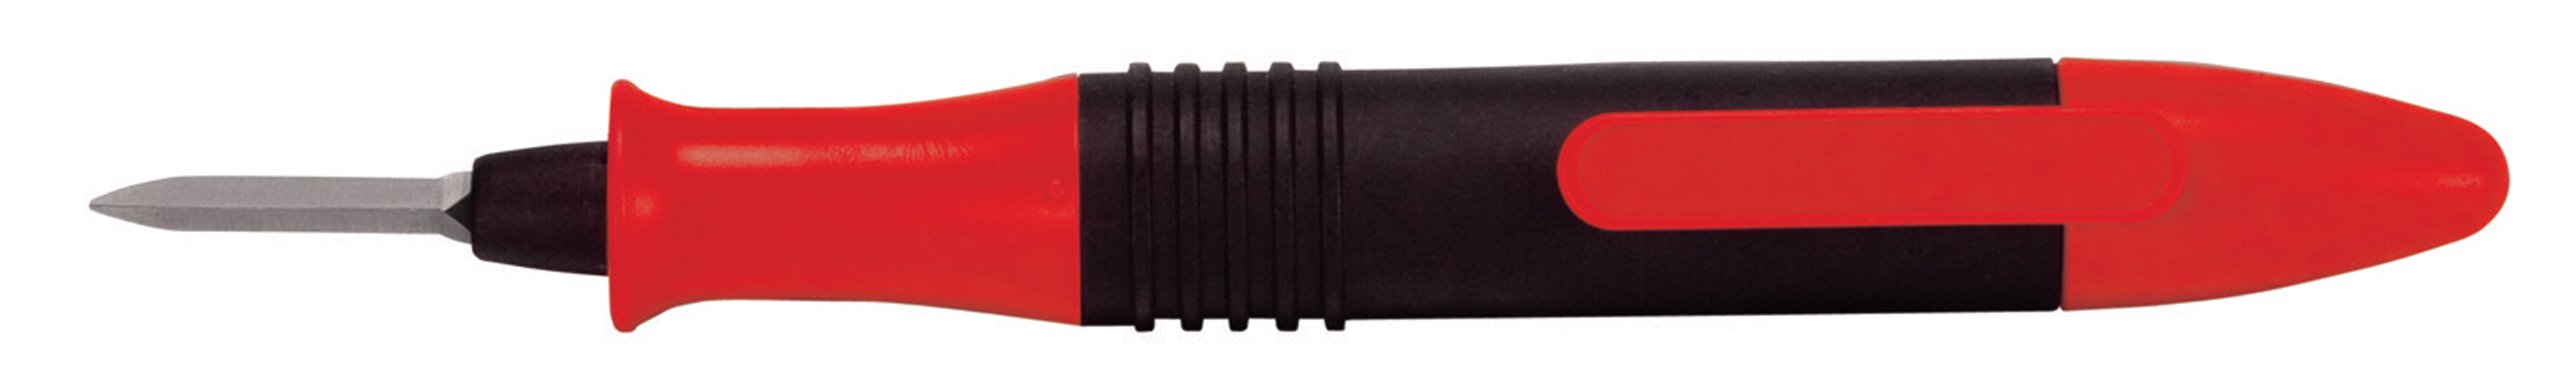 SHAVIV 90079 Scrape-Burr 42 Heavy Duty Scraper